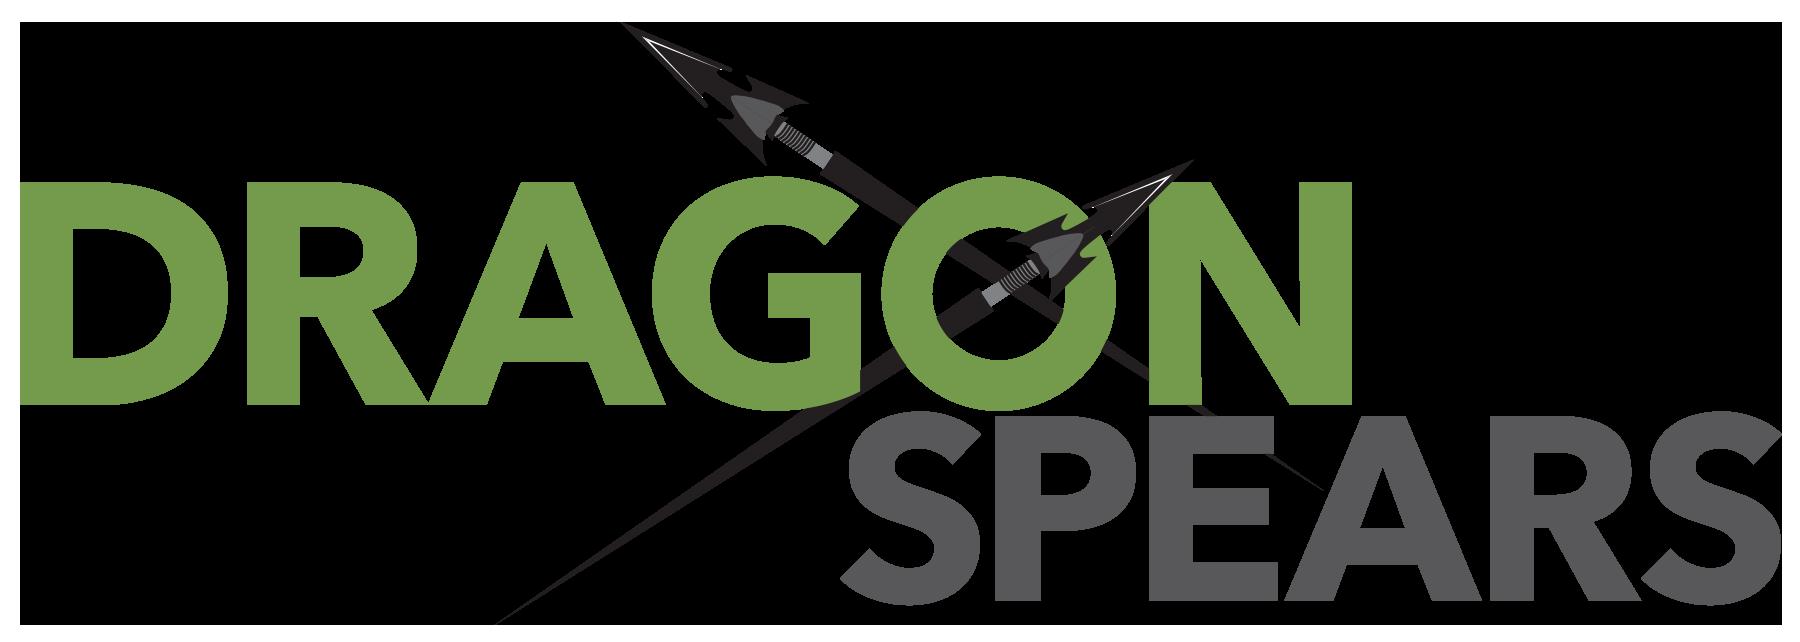 DS-logo-no.tag.png